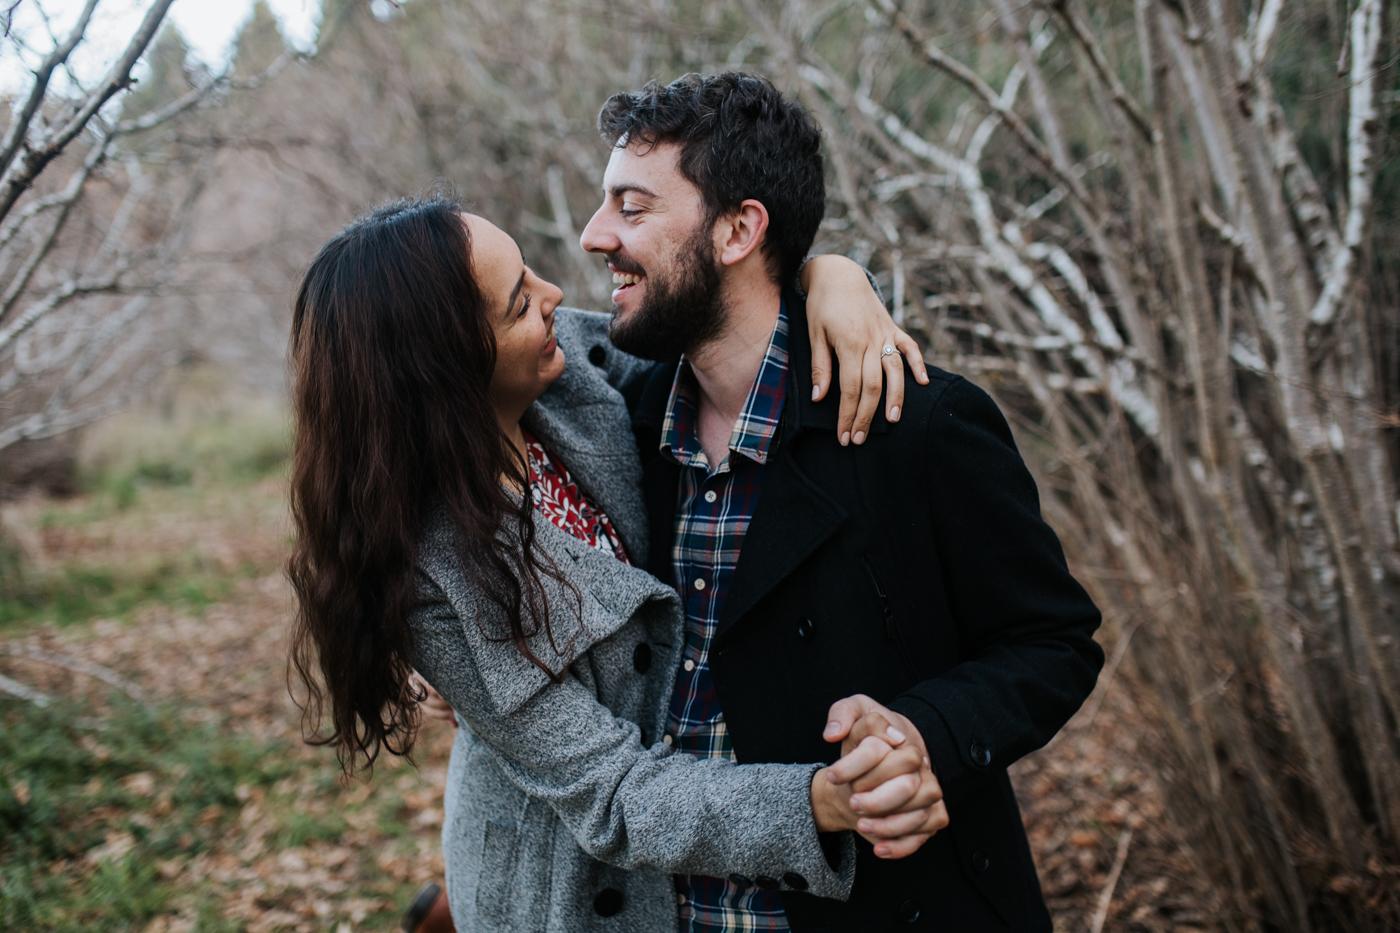 Kate & Kieran - Southern Highlands Engagement - Samantha Heather Photography-37.jpg